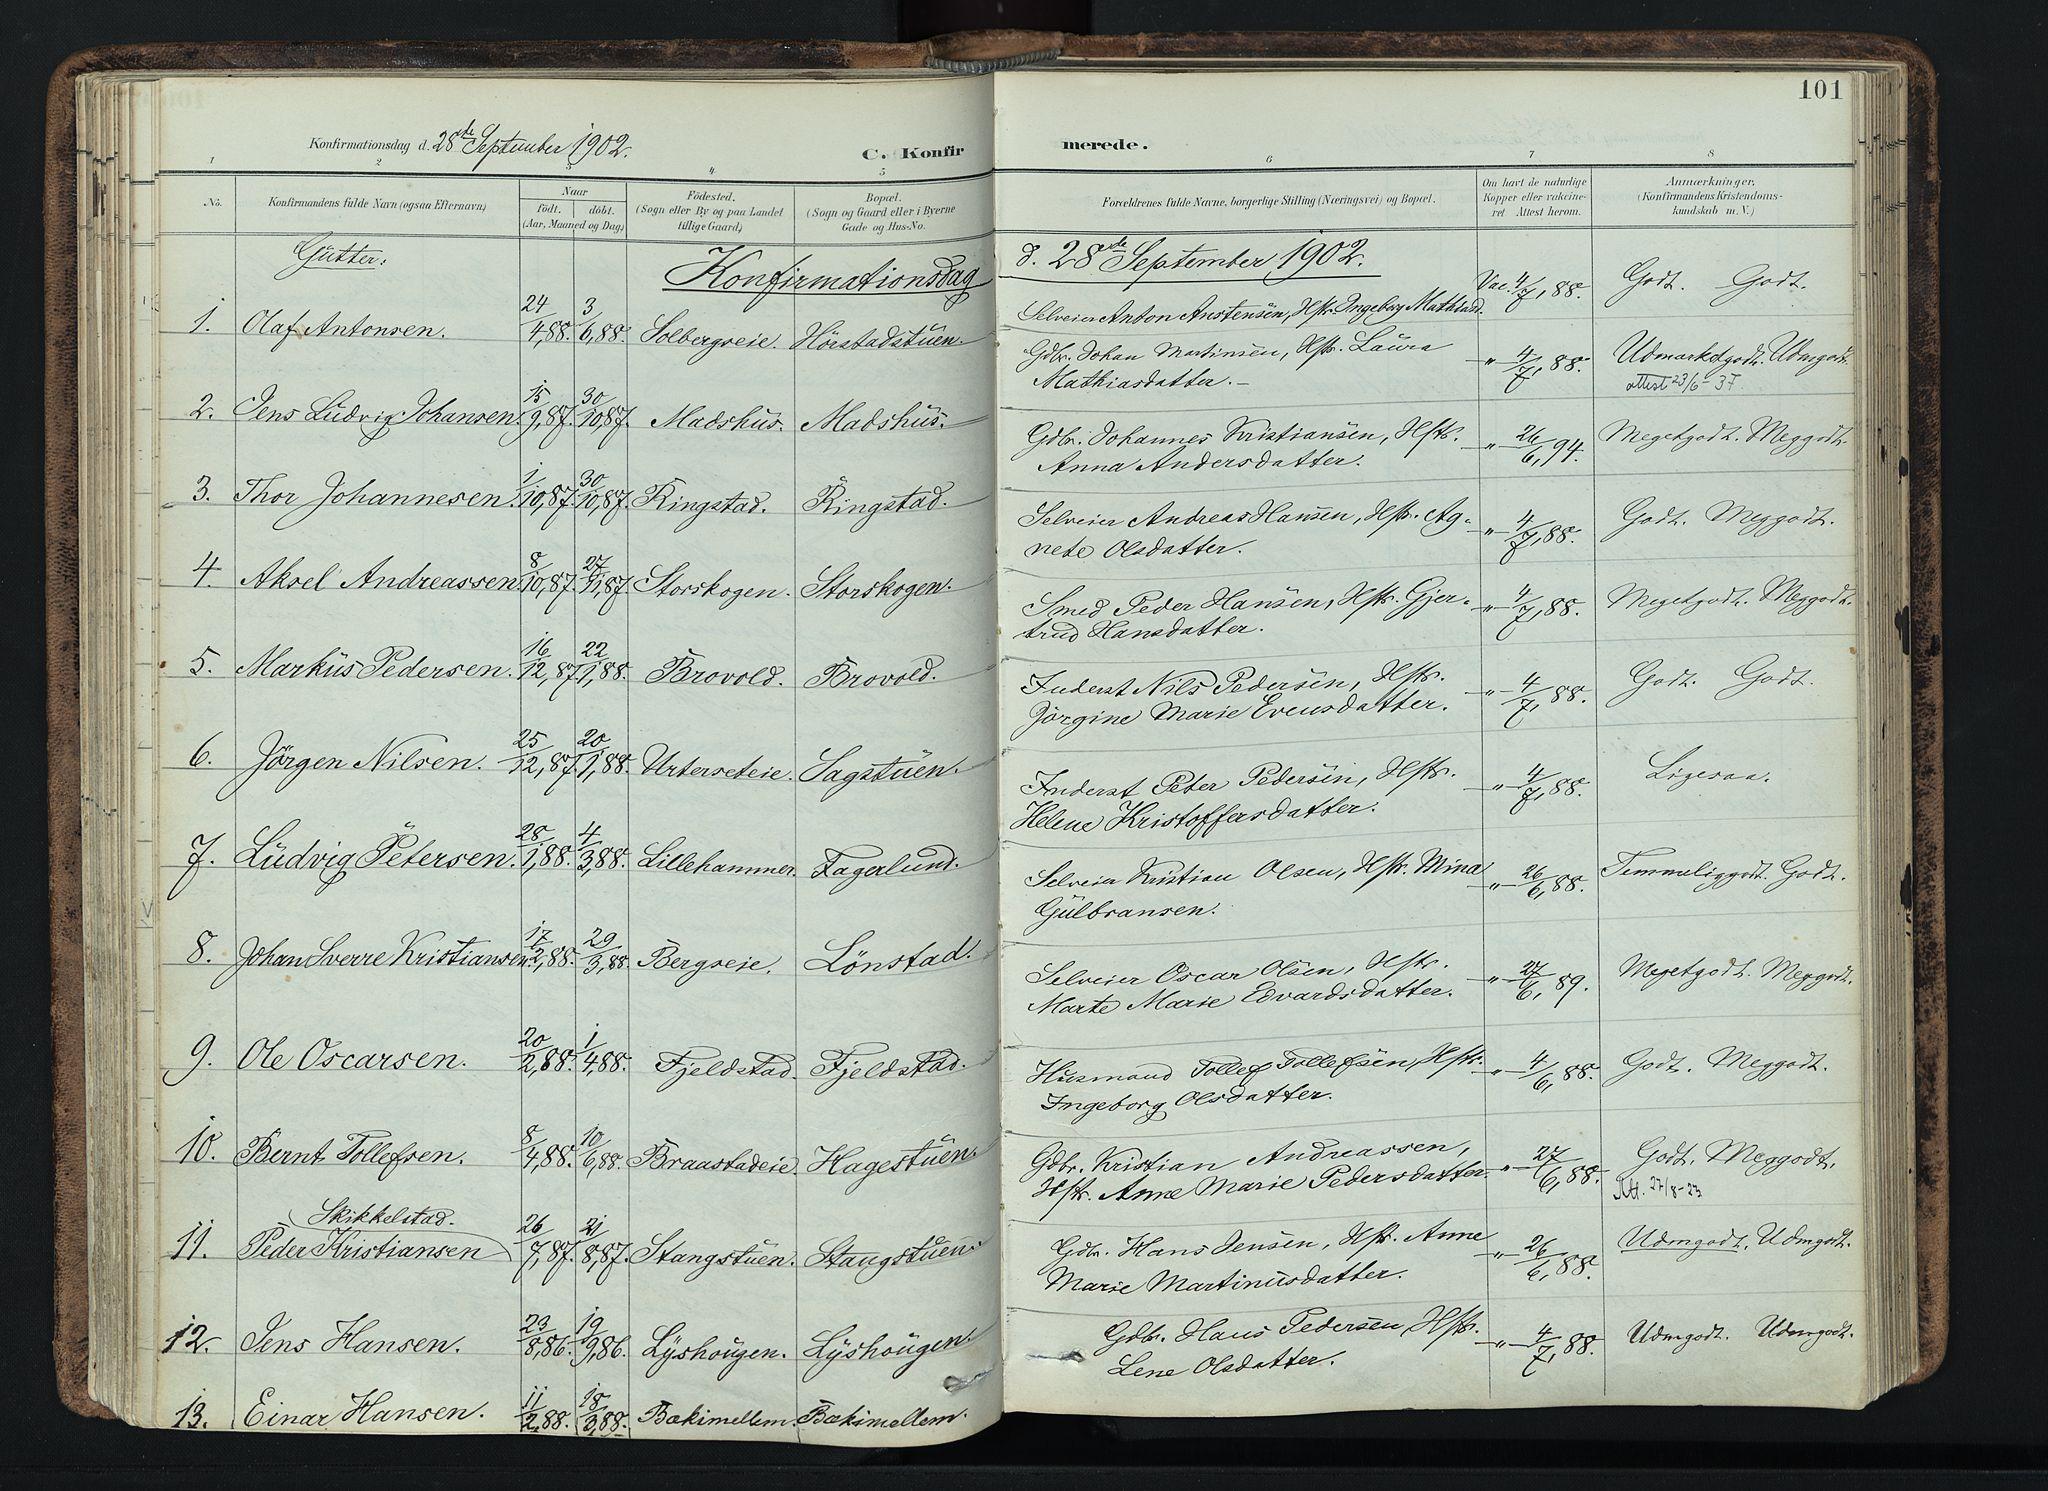 SAH, Vardal prestekontor, H/Ha/Haa/L0019: Ministerialbok nr. 19, 1893-1907, s. 101